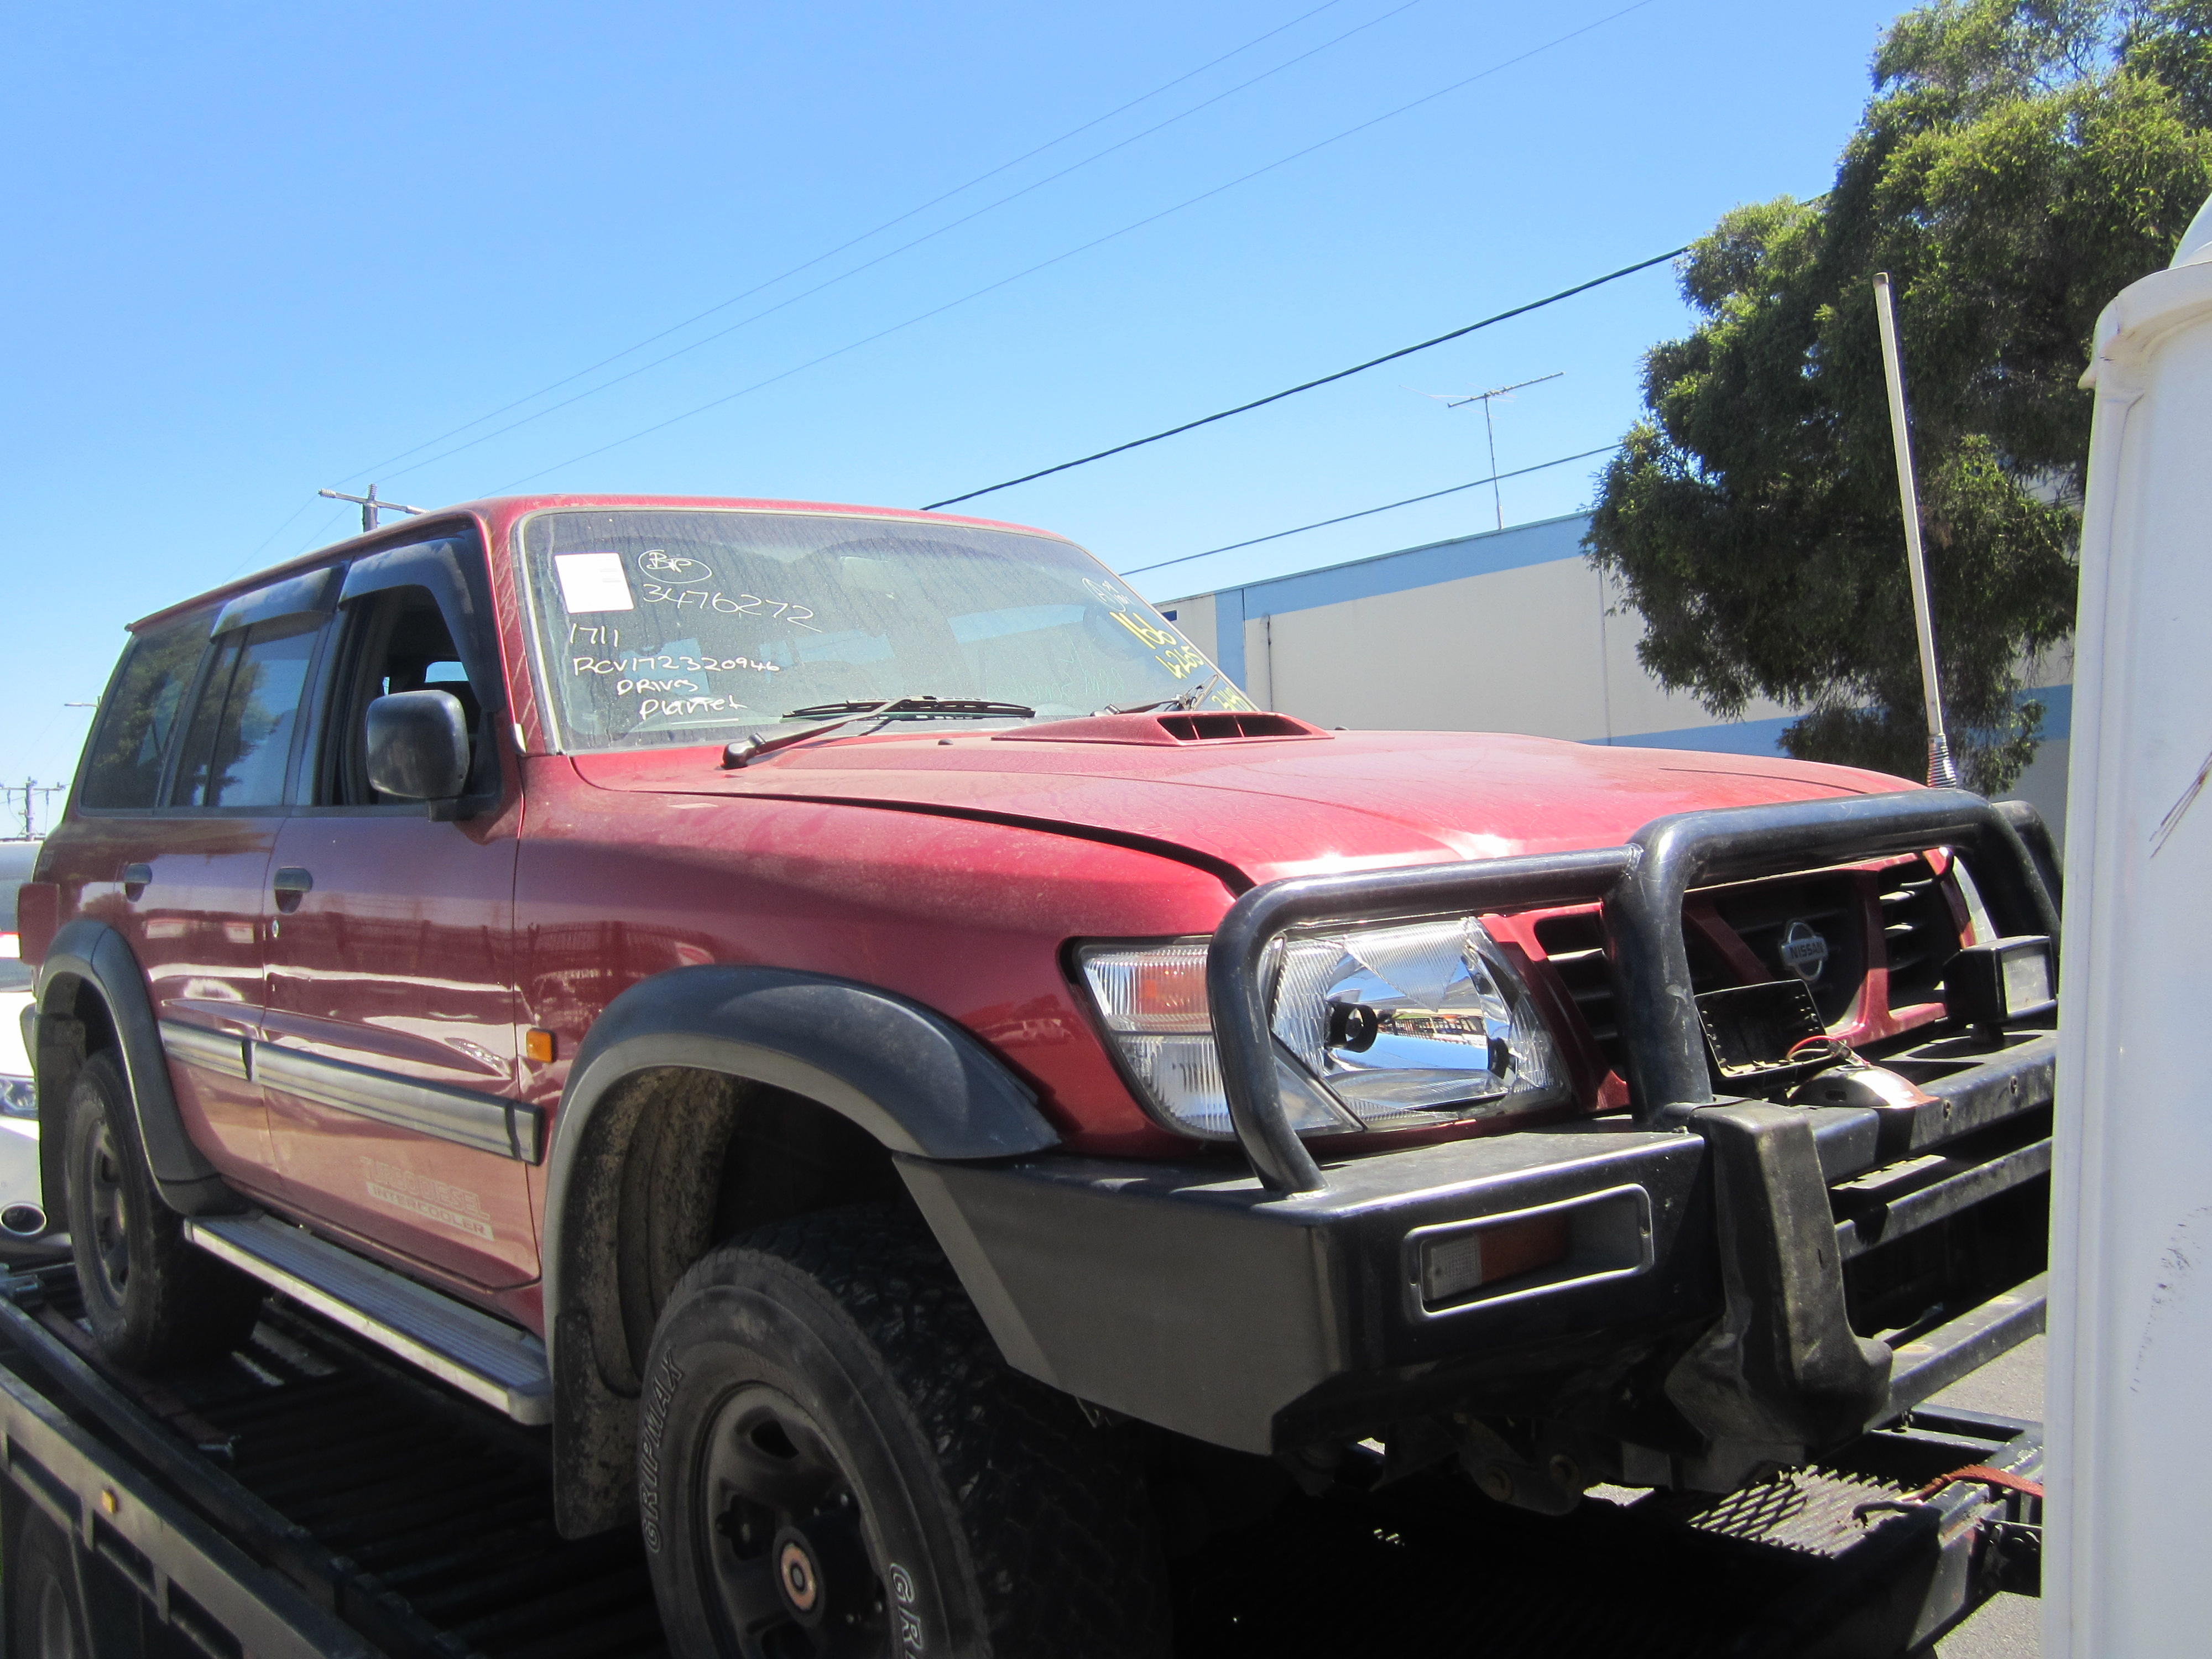 nissan patrol y61 gu st wagon rd28 turbo diesel 1999 wrecking. Black Bedroom Furniture Sets. Home Design Ideas